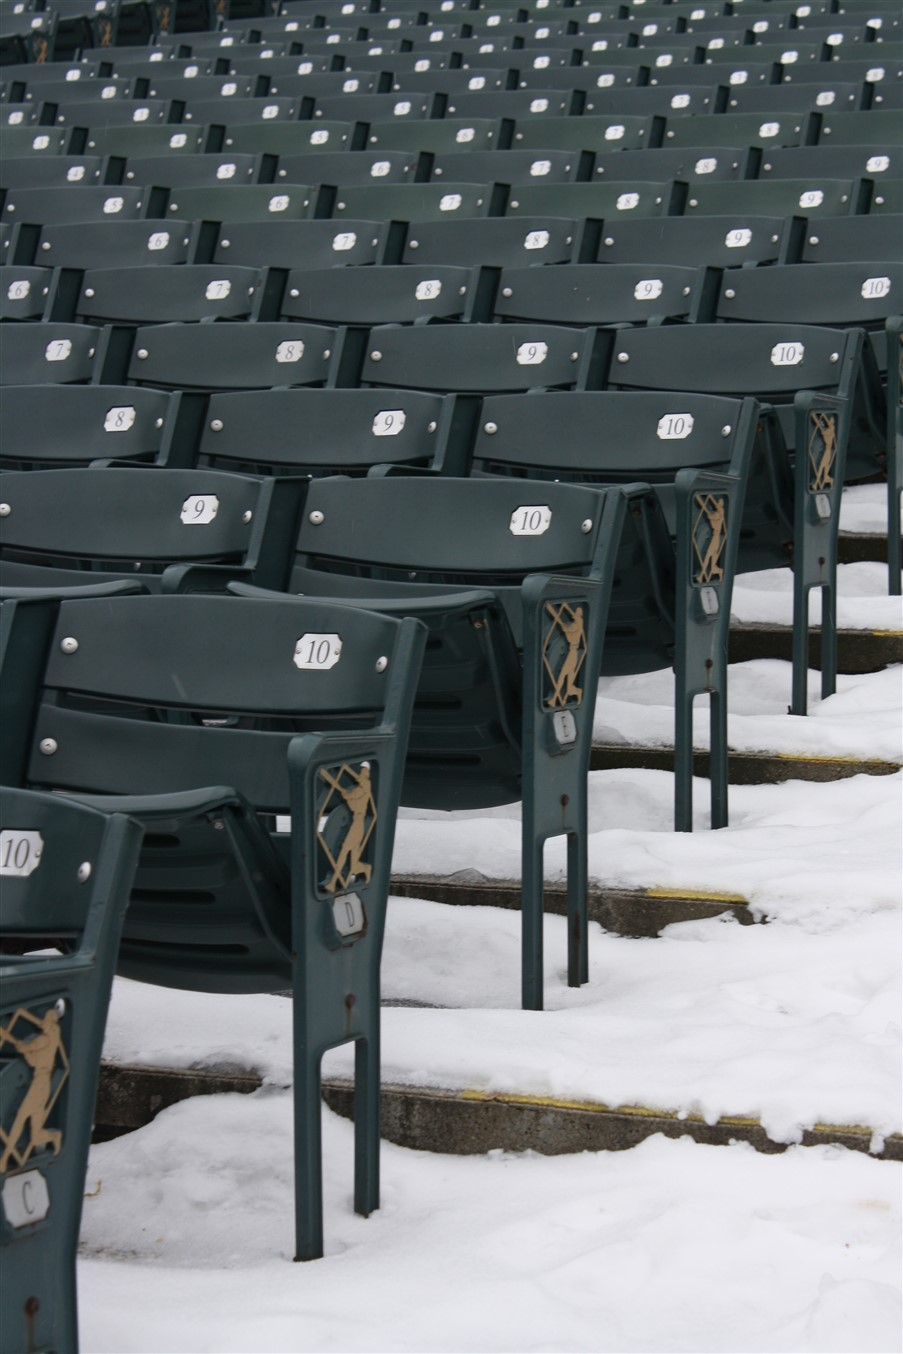 2010 12 27 Cleveland Jacobs Field Snow Days 14.jpg